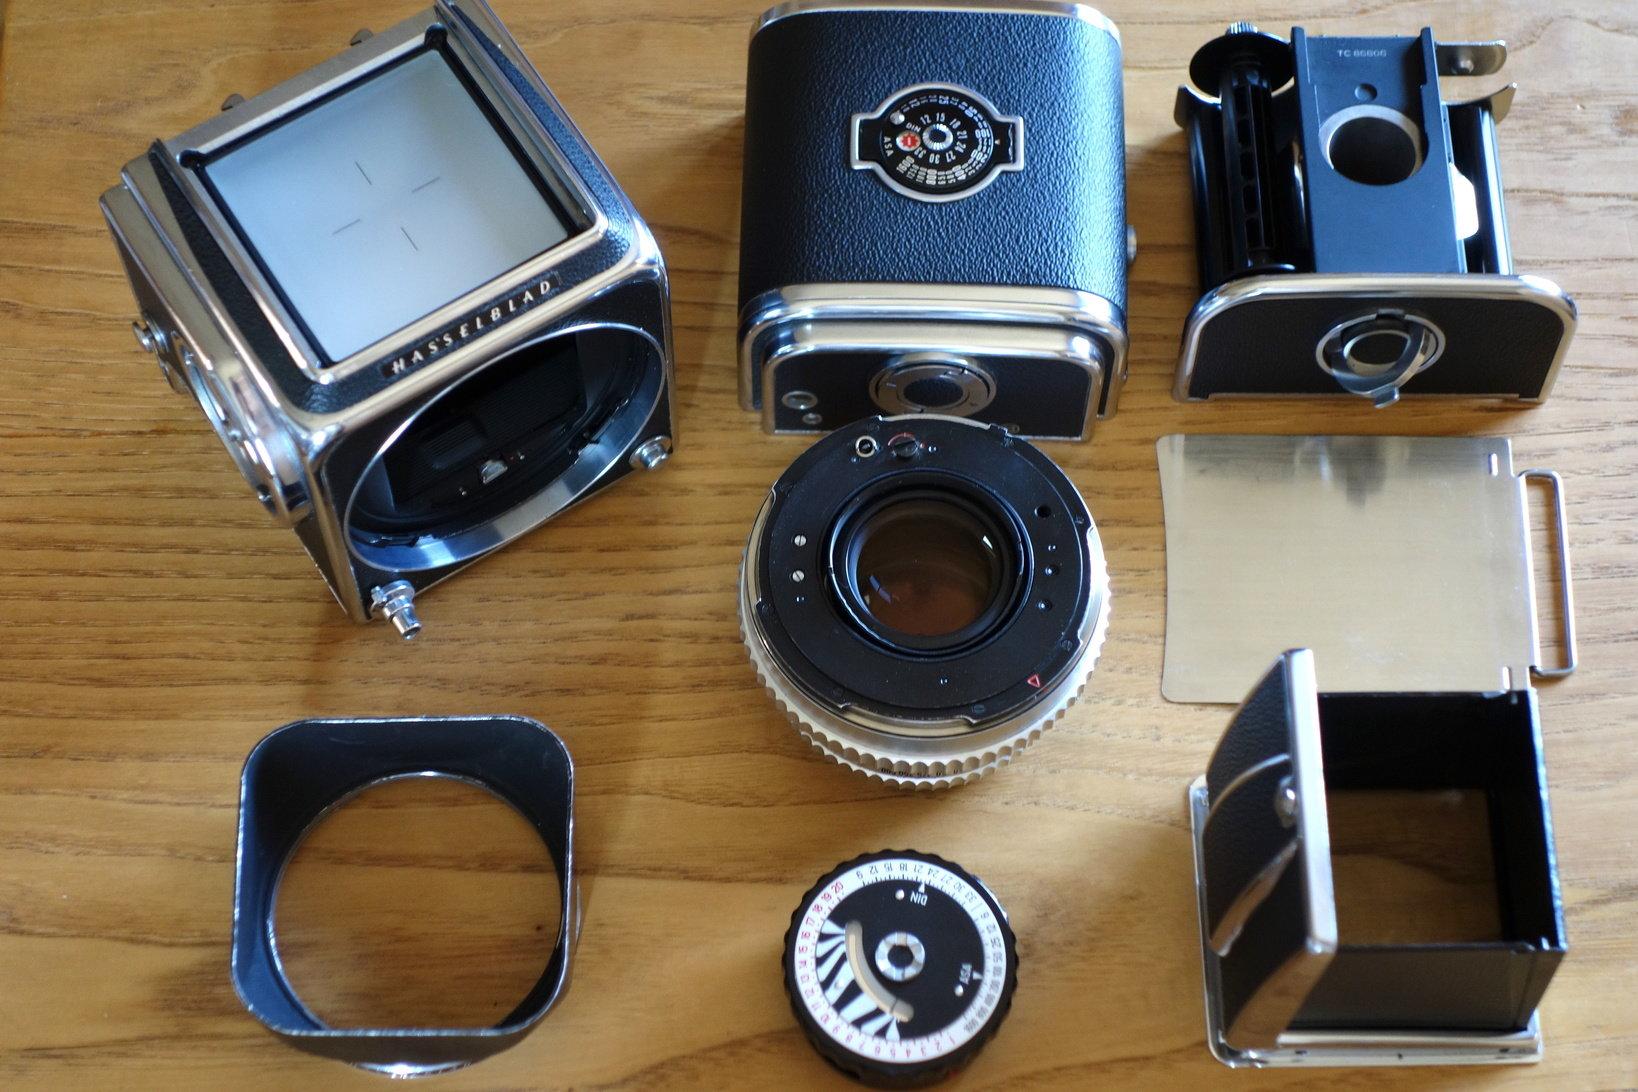 『HASSELBLAD 500C』はボディ、レンズ、マガジン、フォーカシングフード、露出計内蔵の巻き上げノブなどによって構成される。それぞれがカムや歯車で完璧に連動してシャッターが切れる。電気は一切入っていない機械式カメラの頂点といっていい。